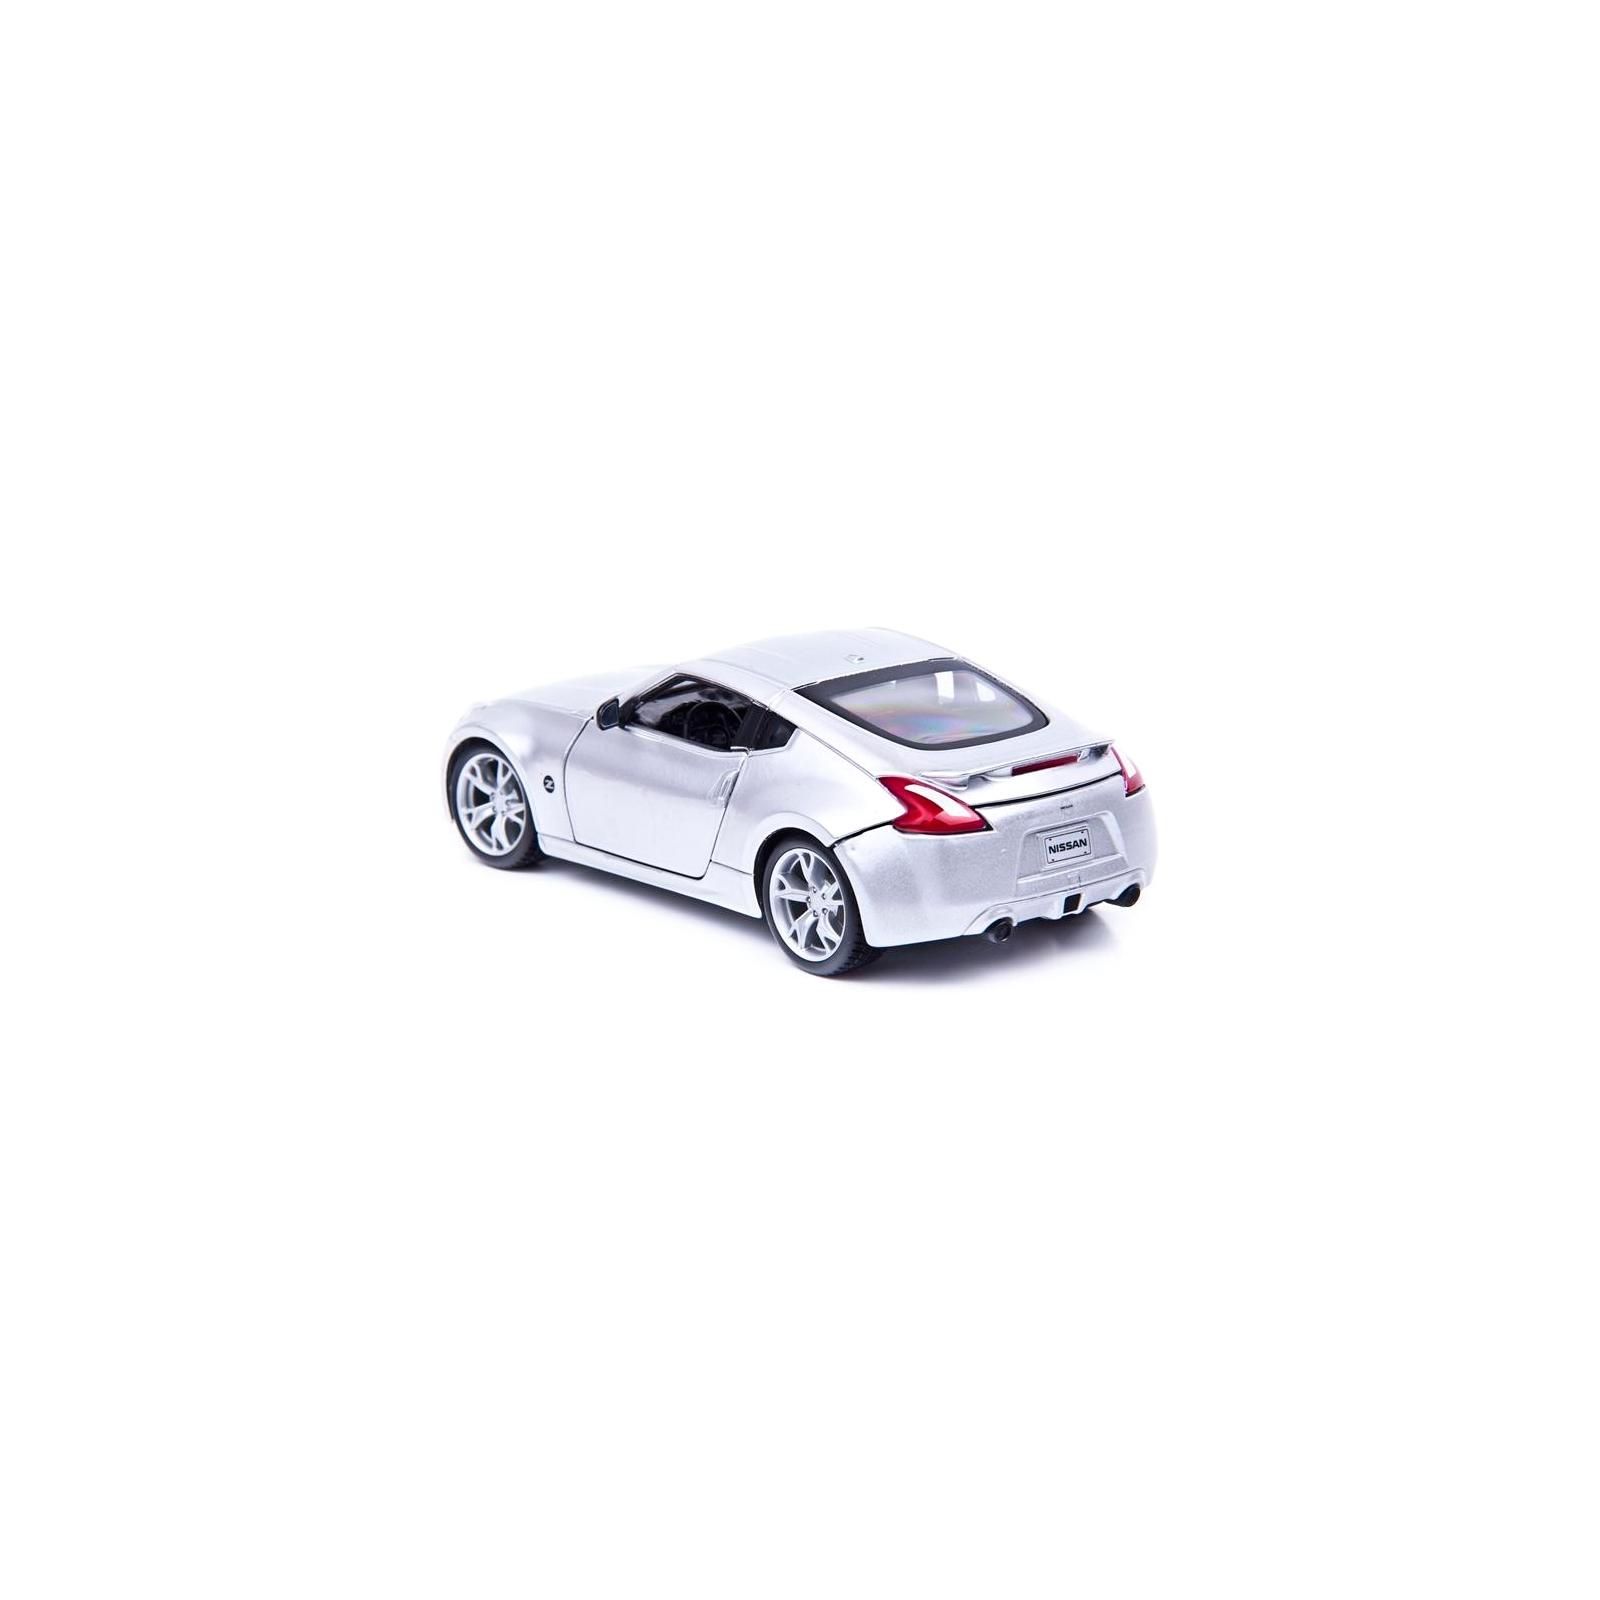 Машина Maisto Nissan 370Z 2009 (1:24) серебристый (31200 silver) изображение 2